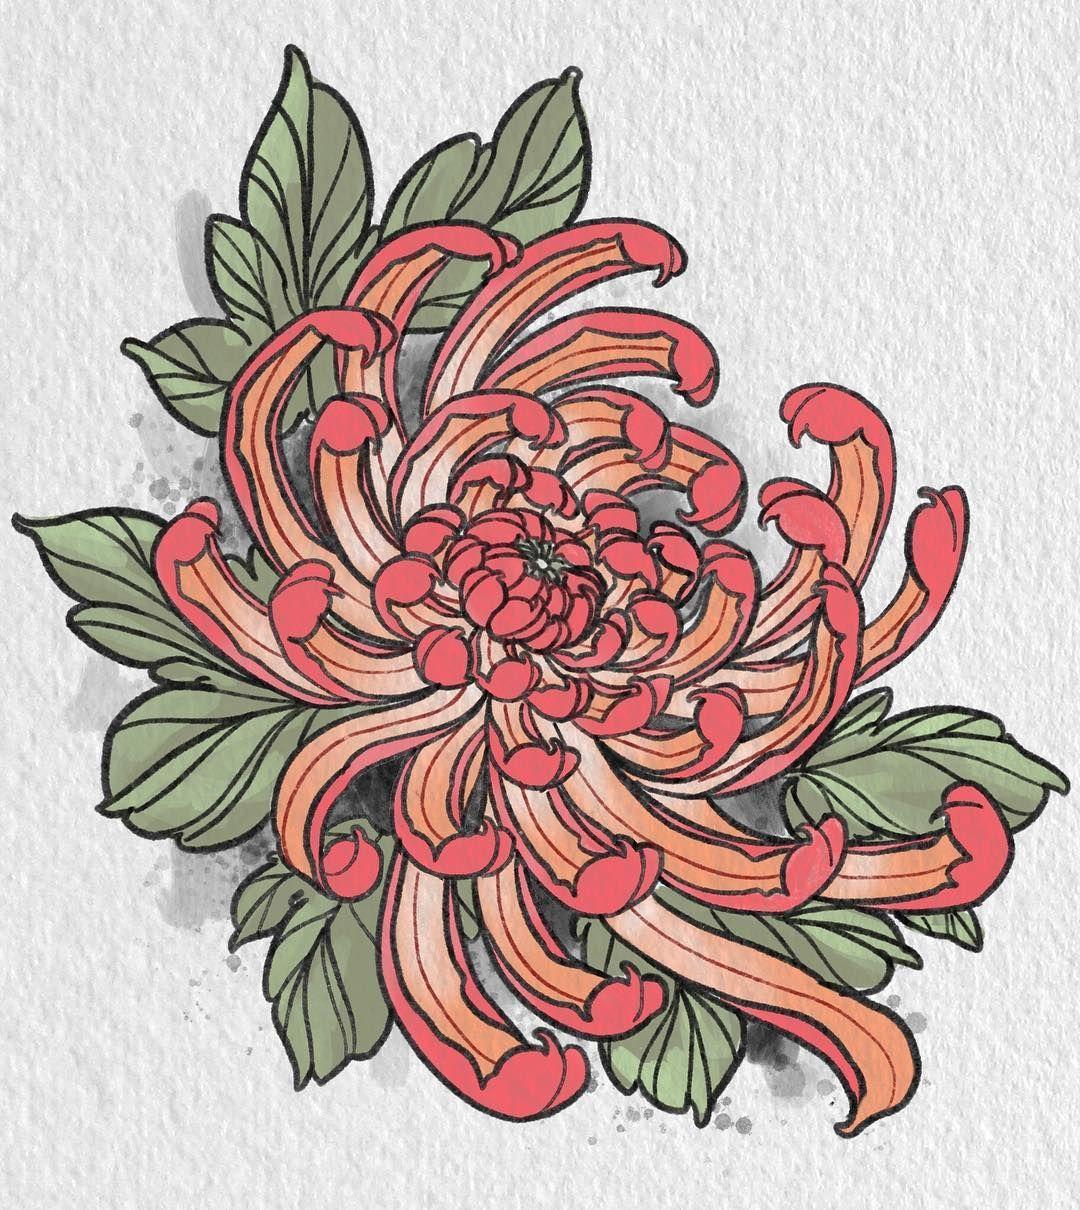 Horichou Tren Instagram Always Down To Tattoo Mums Stevestontattoocompany Booking Fo Japanese Flower Tattoo Chrysanthemum Flower Tattoo Chrysanthemum Tattoo